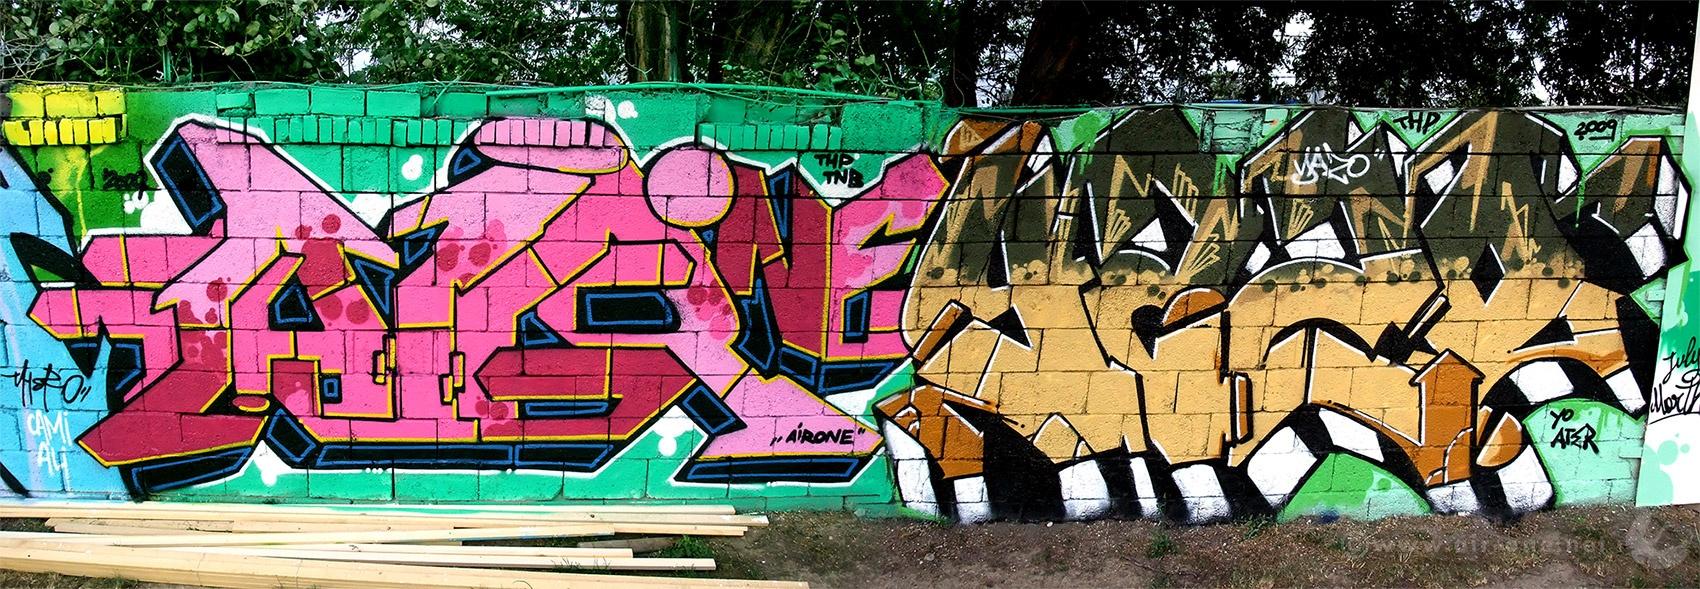 Airone + Yazo - Milano 2009